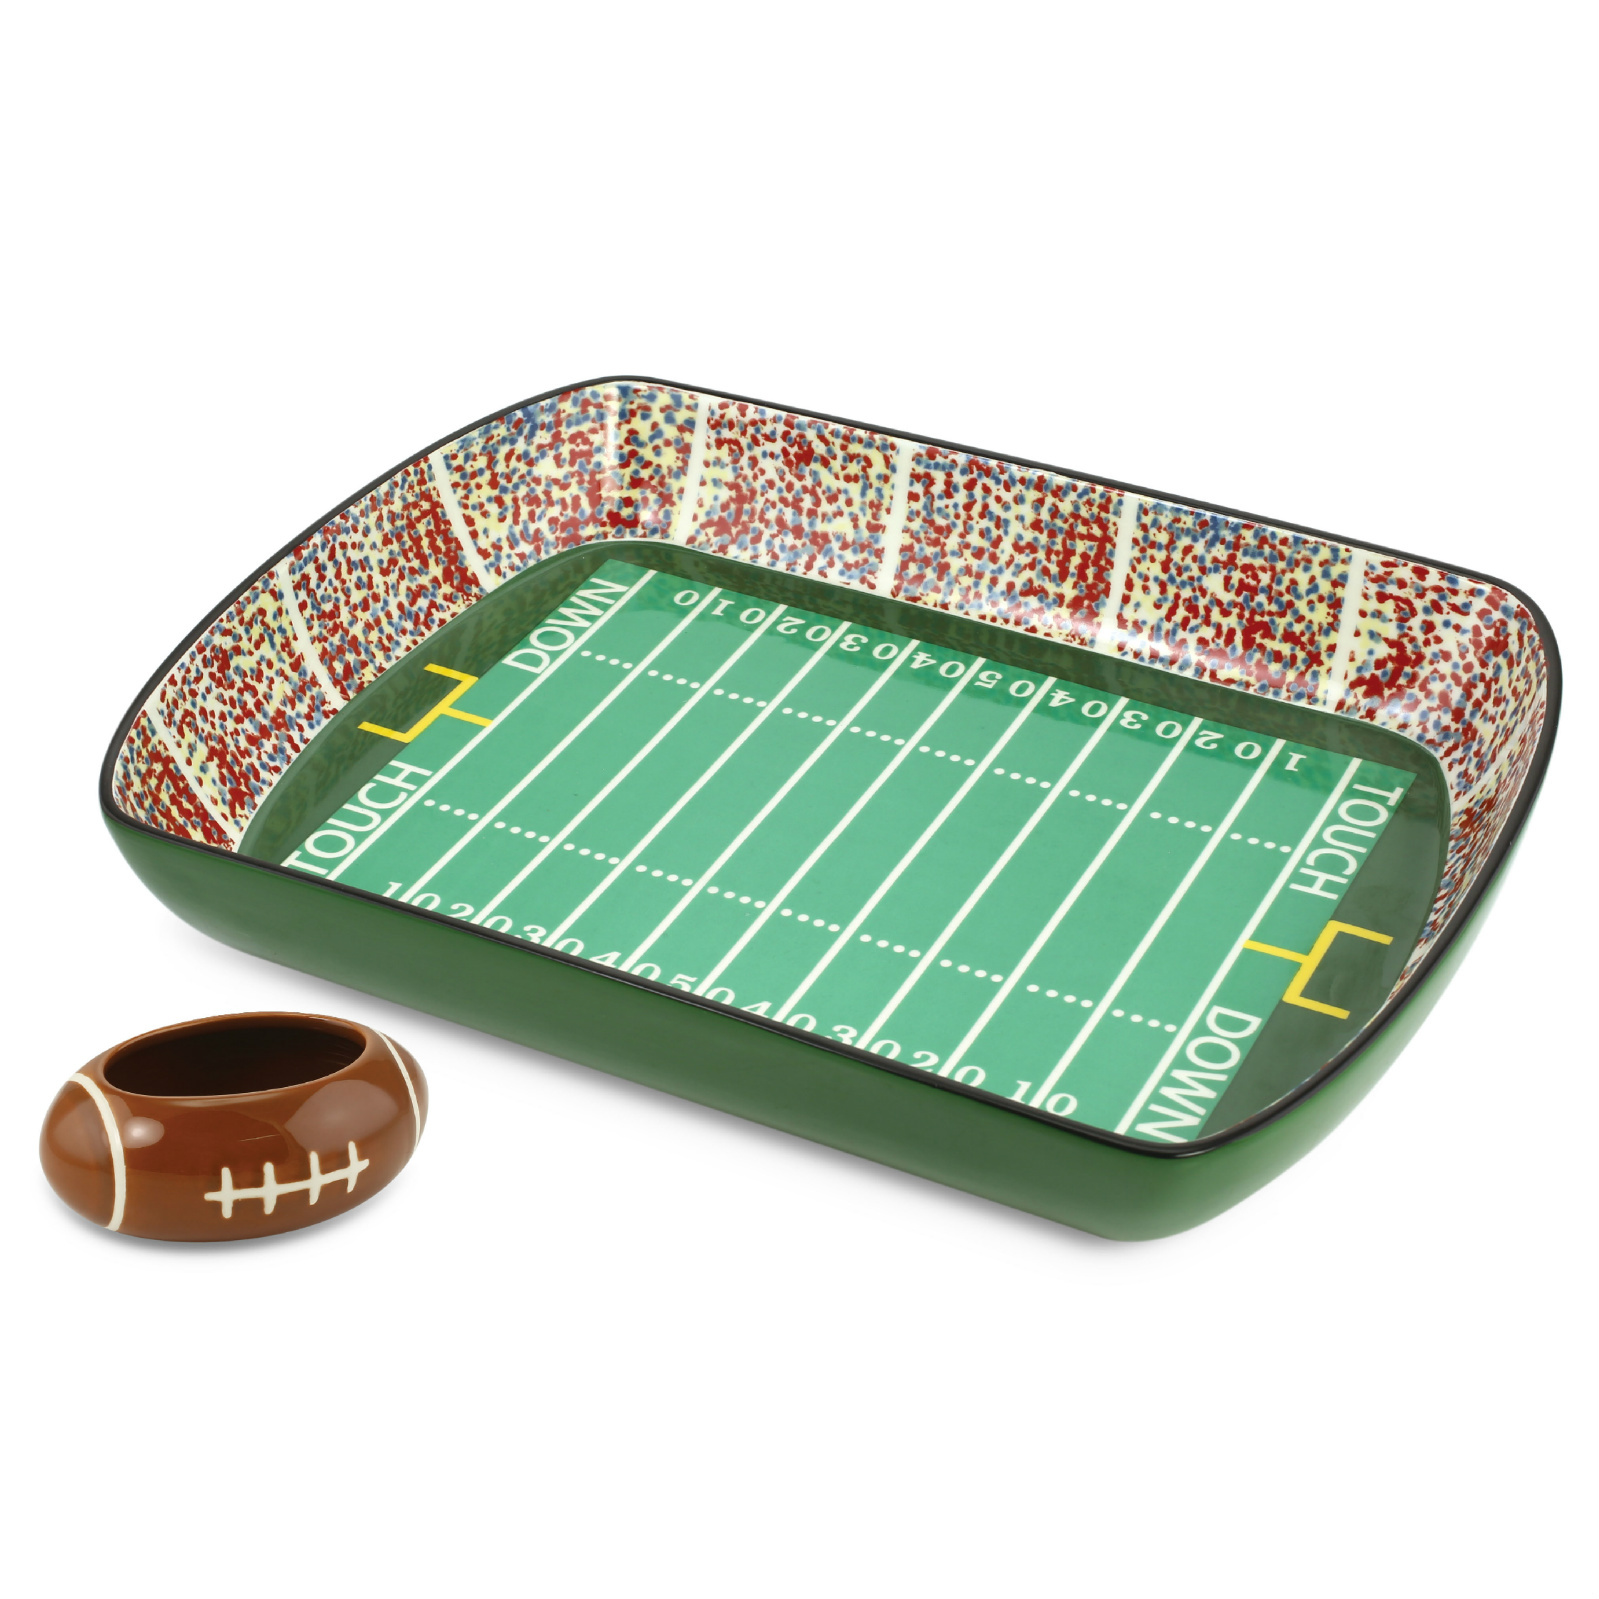 Ceramic Chip And Dip Dish Set Football Stadium Tray Party Snack Bowl